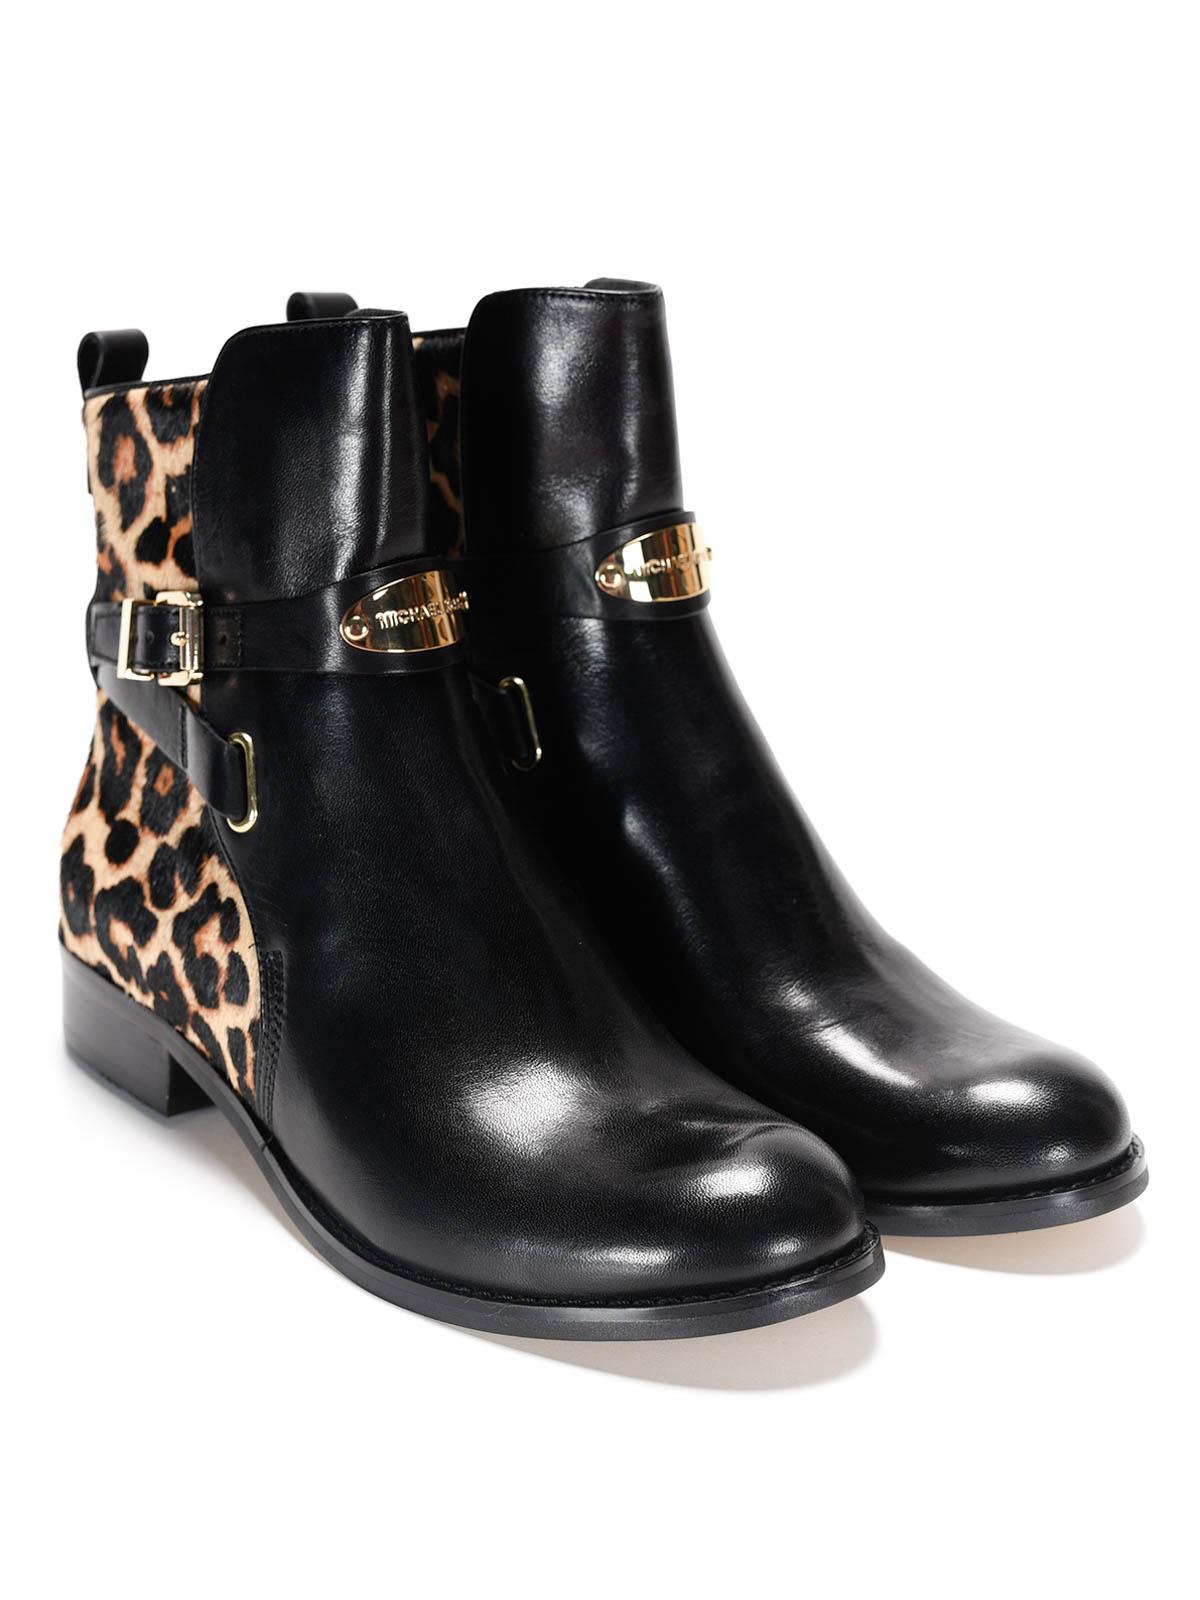 michael kors arley leather ankle boots ankle boots. Black Bedroom Furniture Sets. Home Design Ideas